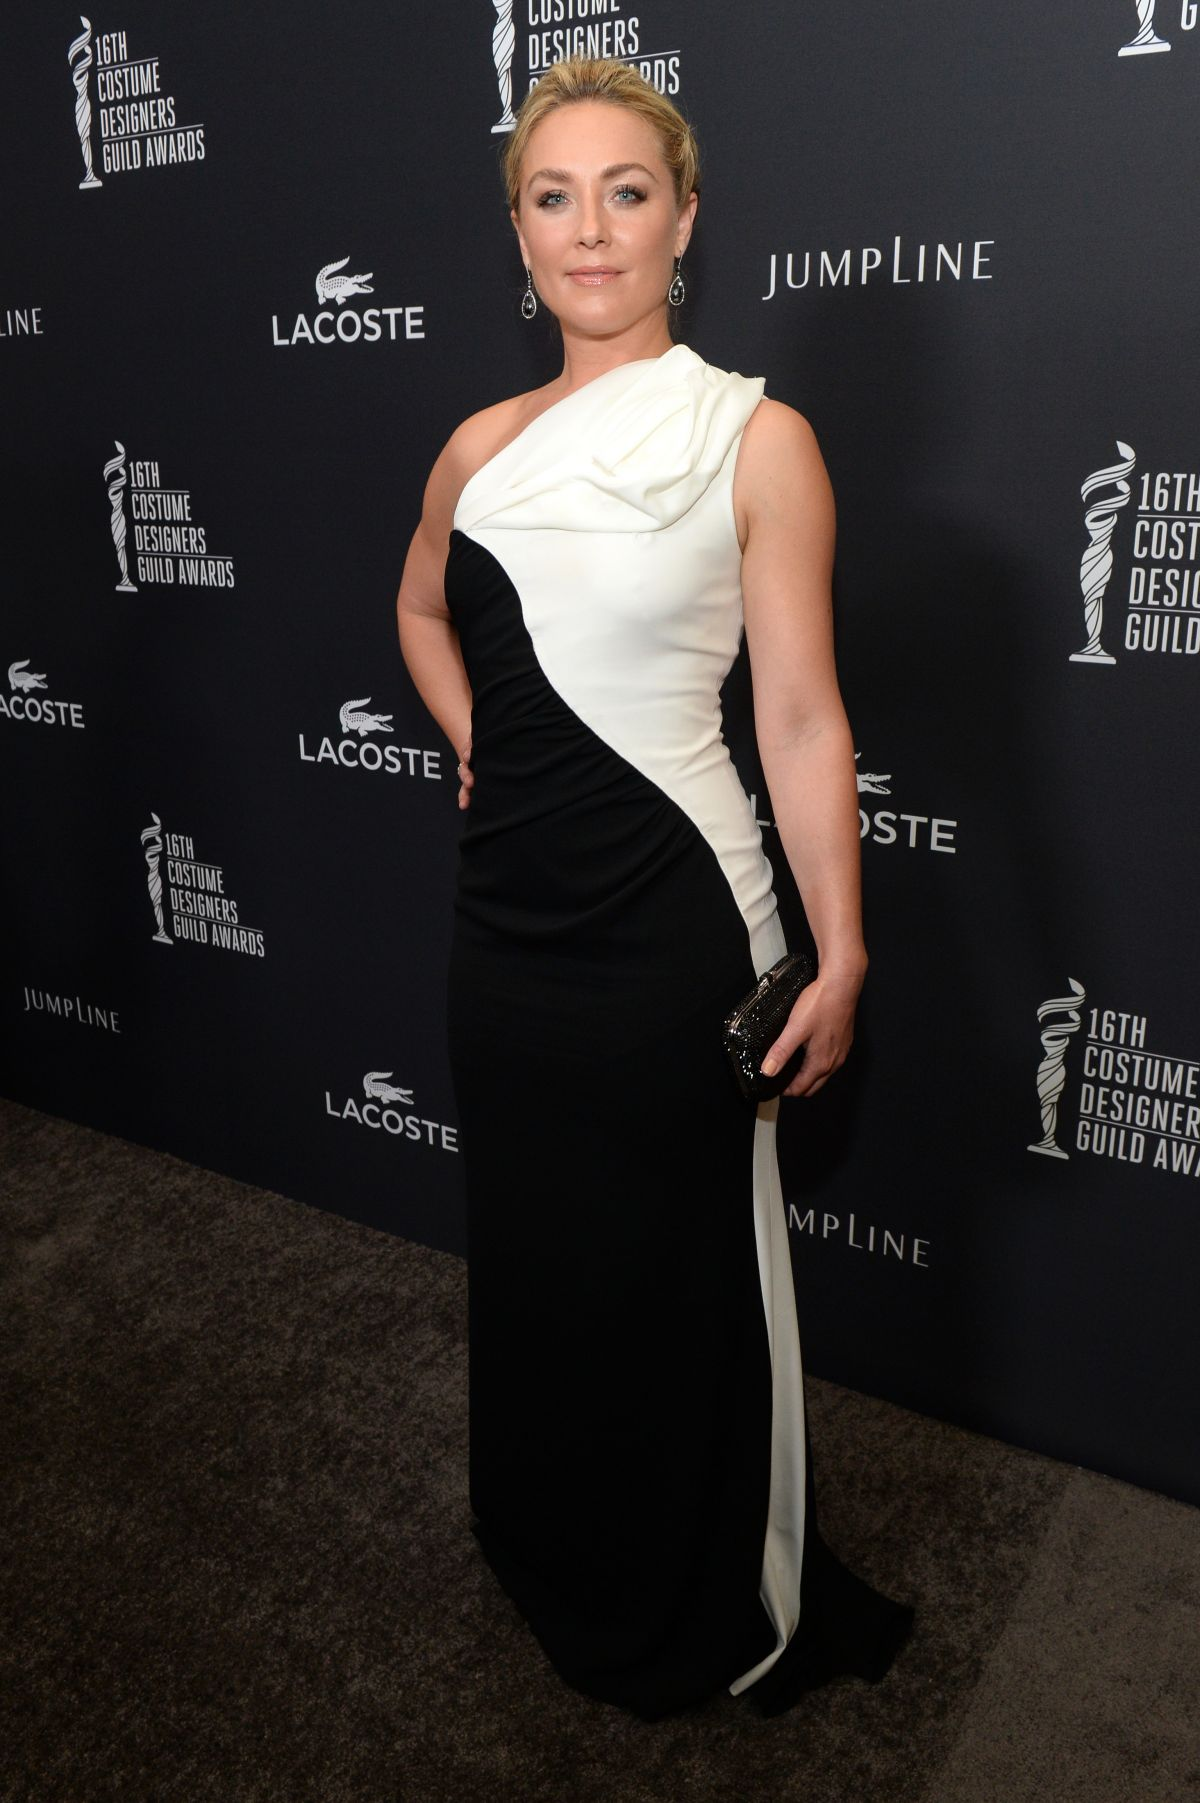 ELISABETH ROHM at 2014 Costume Designers Guild Awards in Beverly Hills